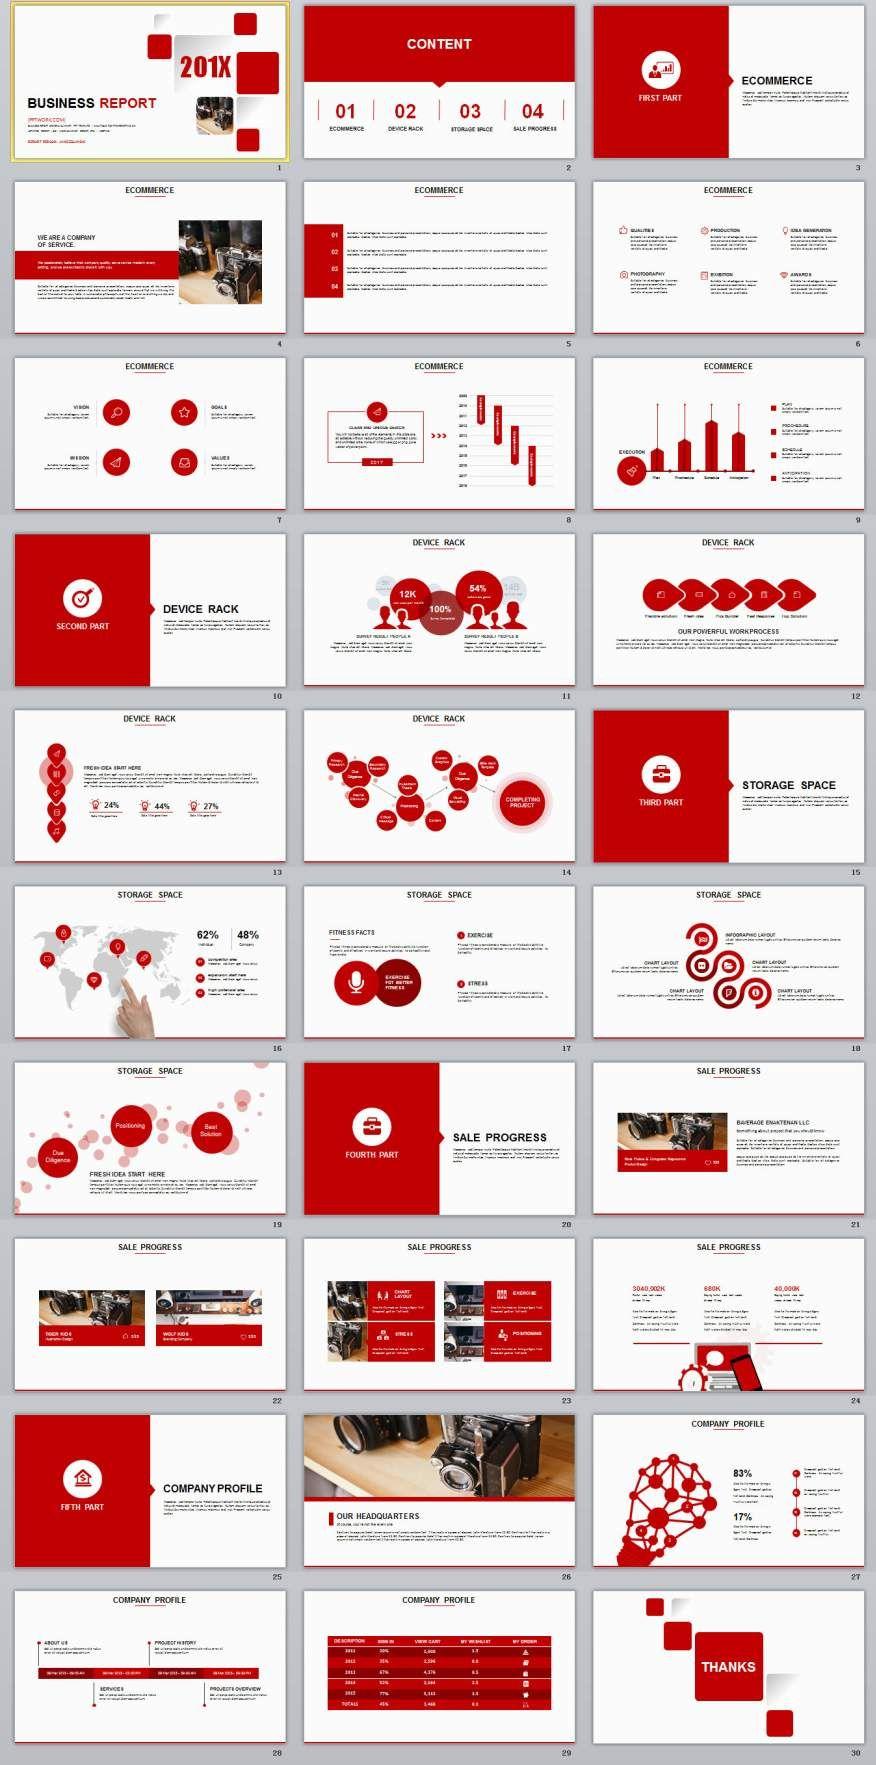 30 red business report powerpoint templates template business 30 red business report powerpoint templates toneelgroepblik Choice Image